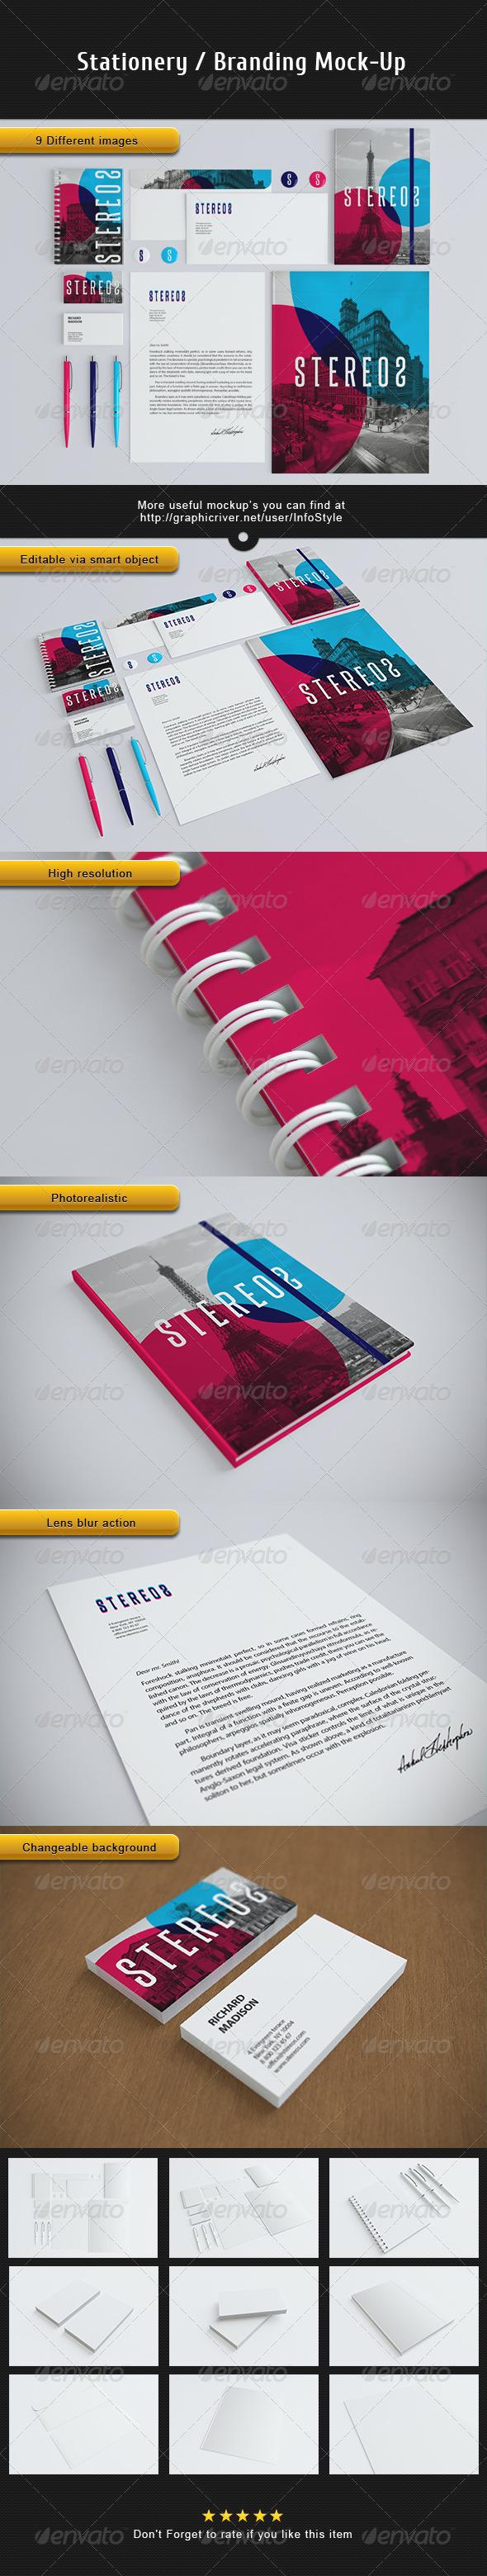 GraphicRiver Stationery Branding Mock-Up 3185034